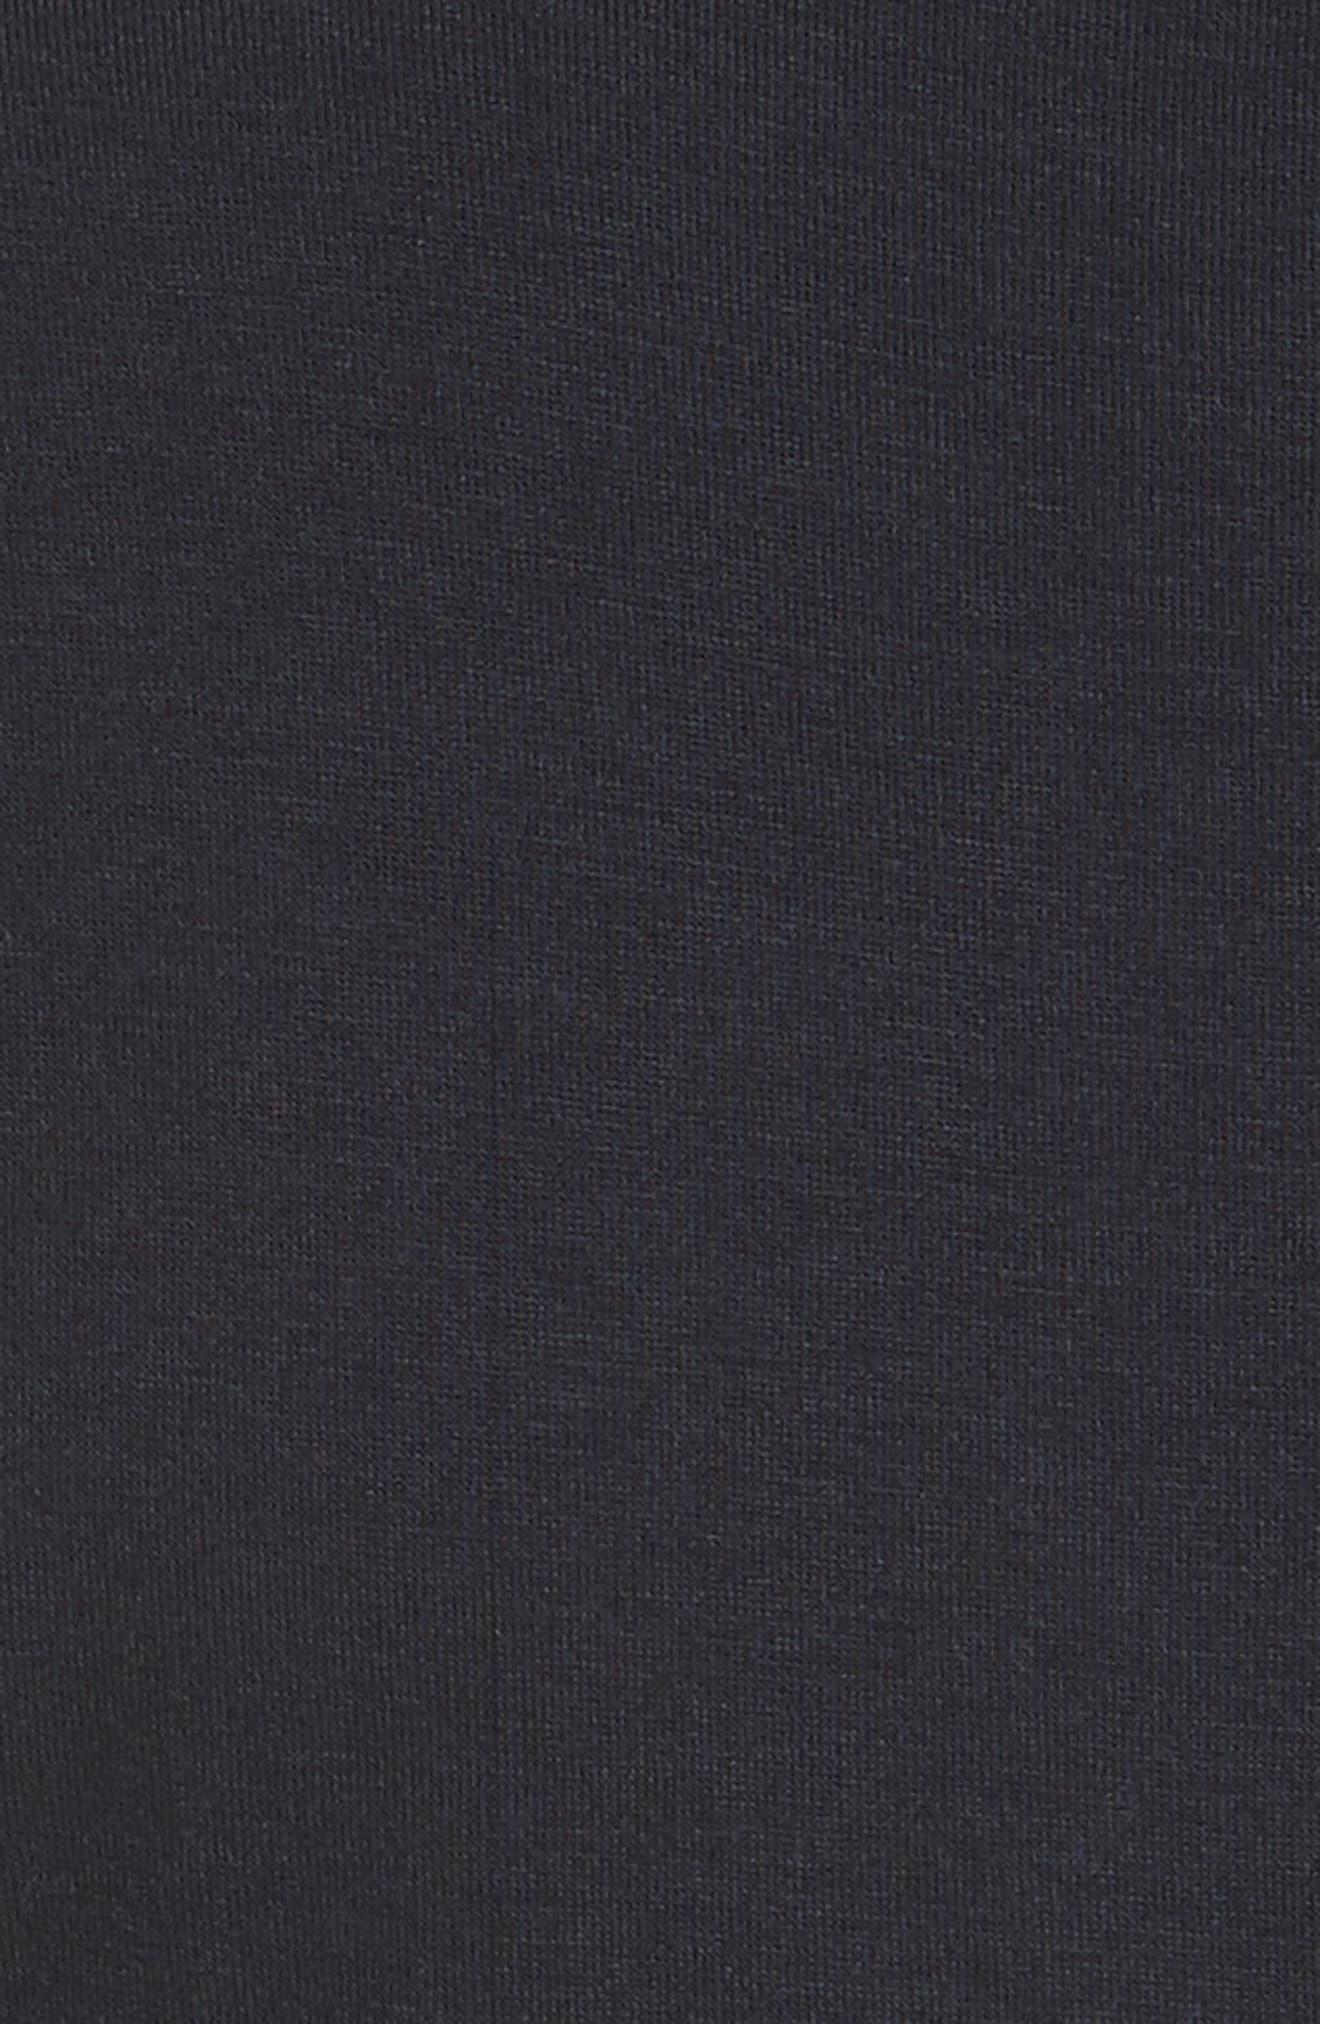 Petalo Twisted Dress,                             Alternate thumbnail 5, color,